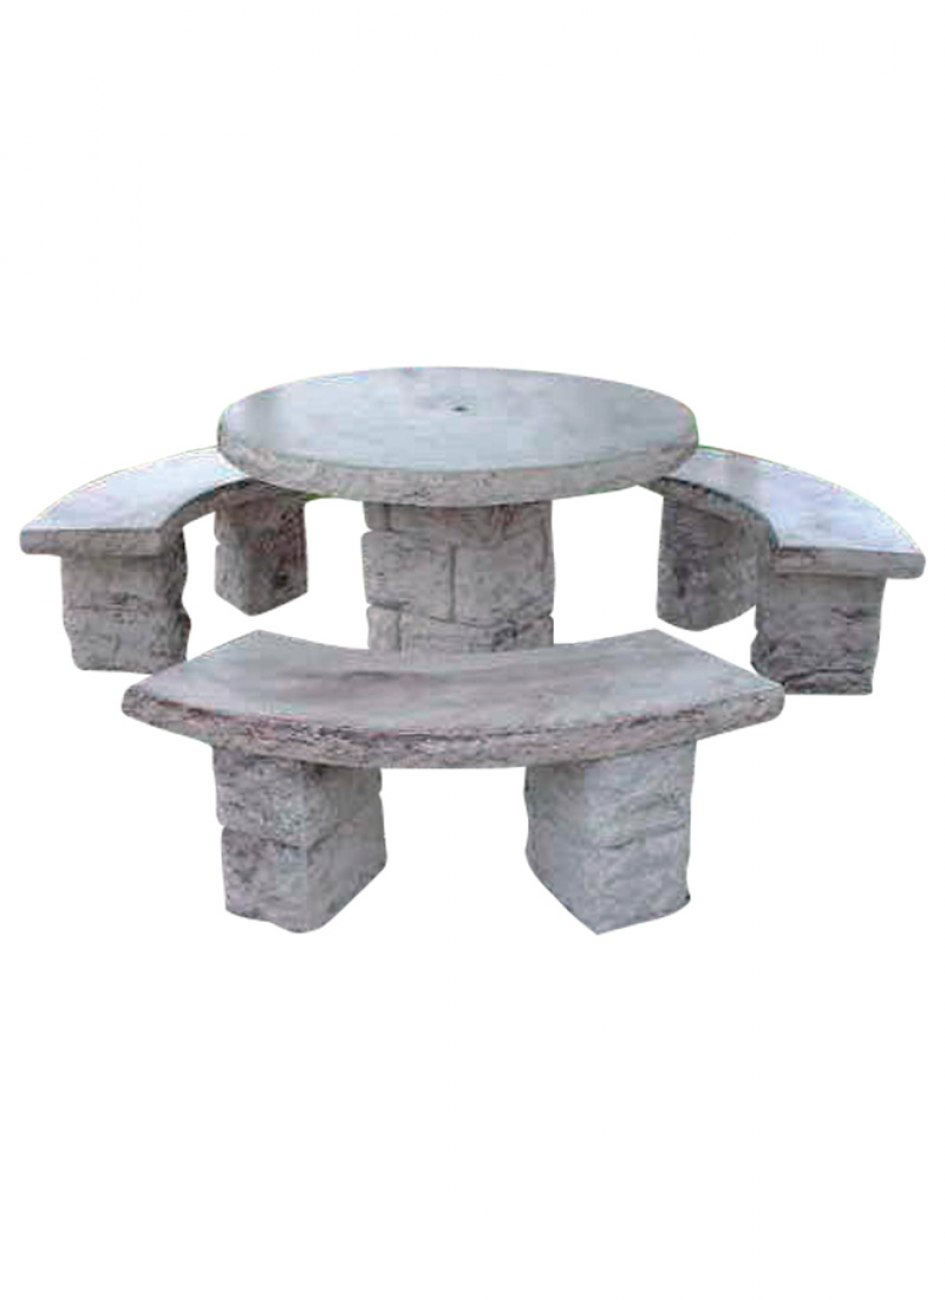 Salon de jardin en pierre reconstitue imitation pierre sche